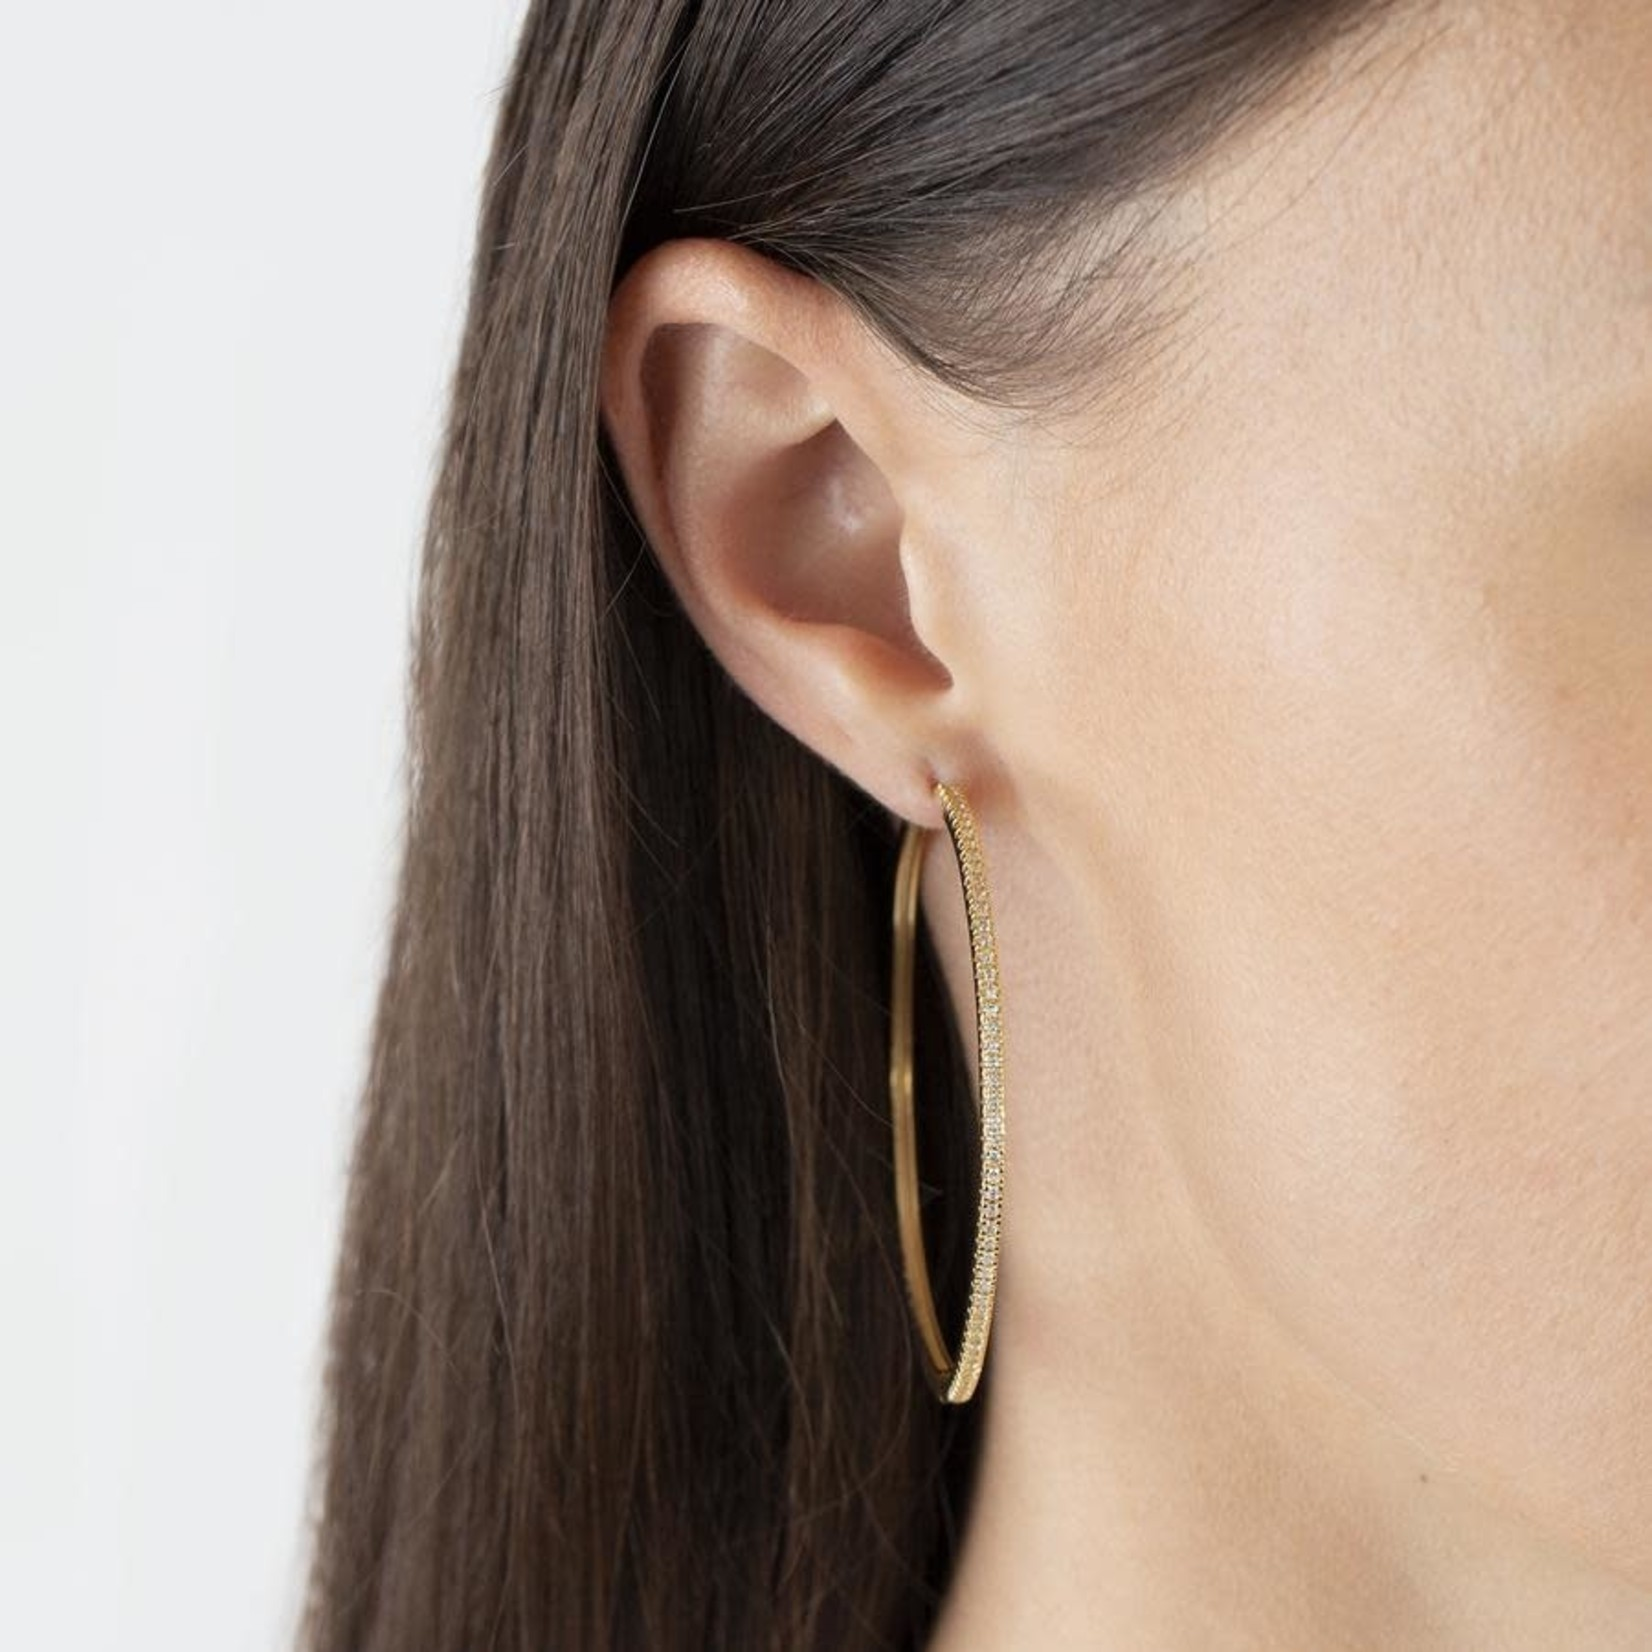 Adinas Large CZ Thin Hoop Earring